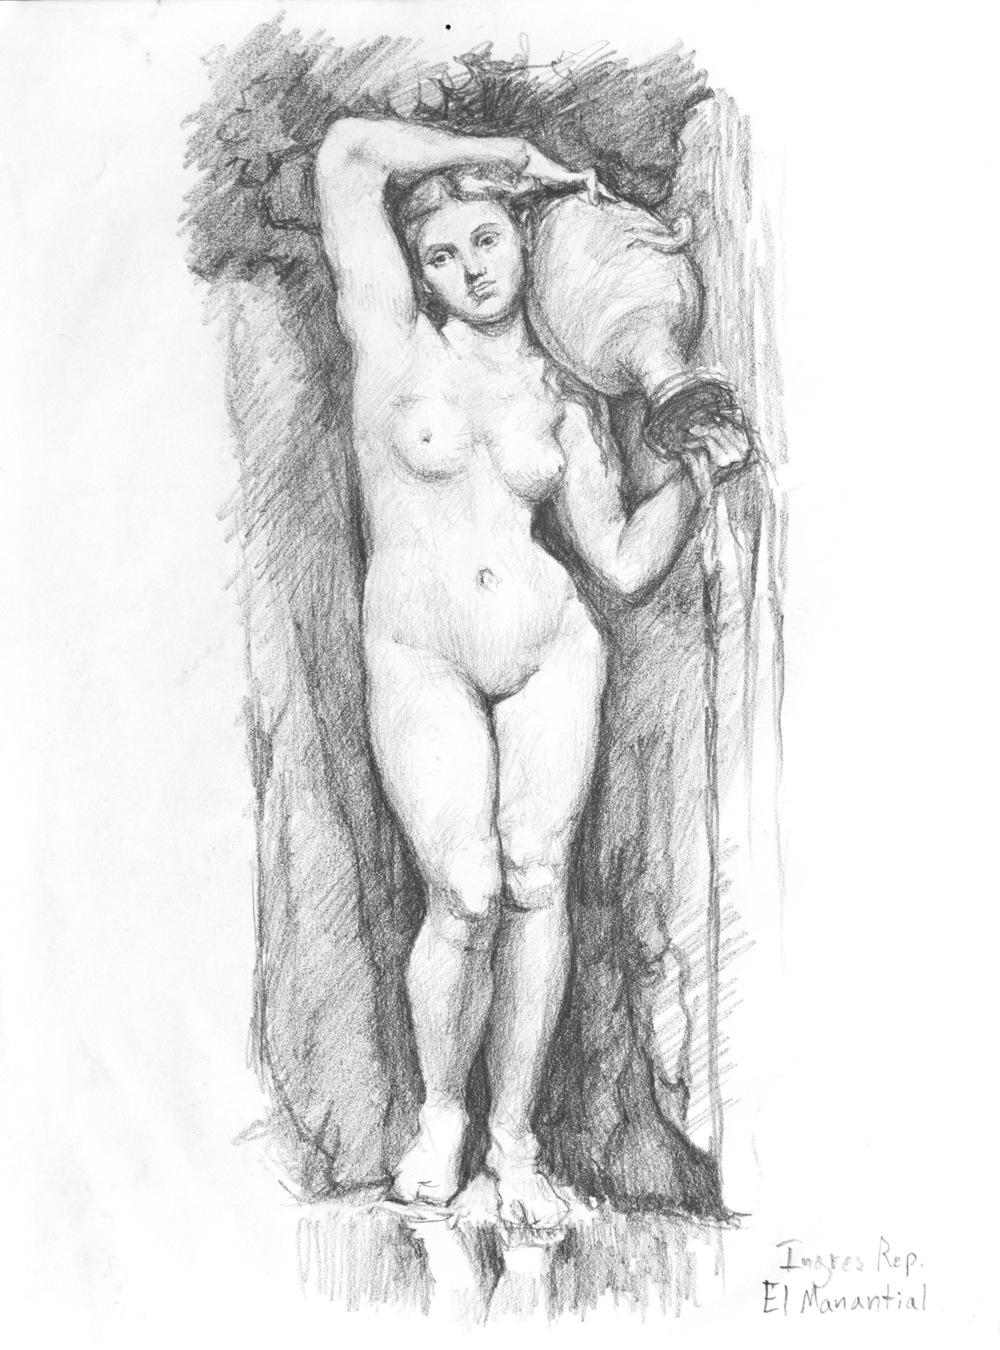 """El Mantial"" - 8.5"" x 11""graphite on paper, Ingres copy. 2012"